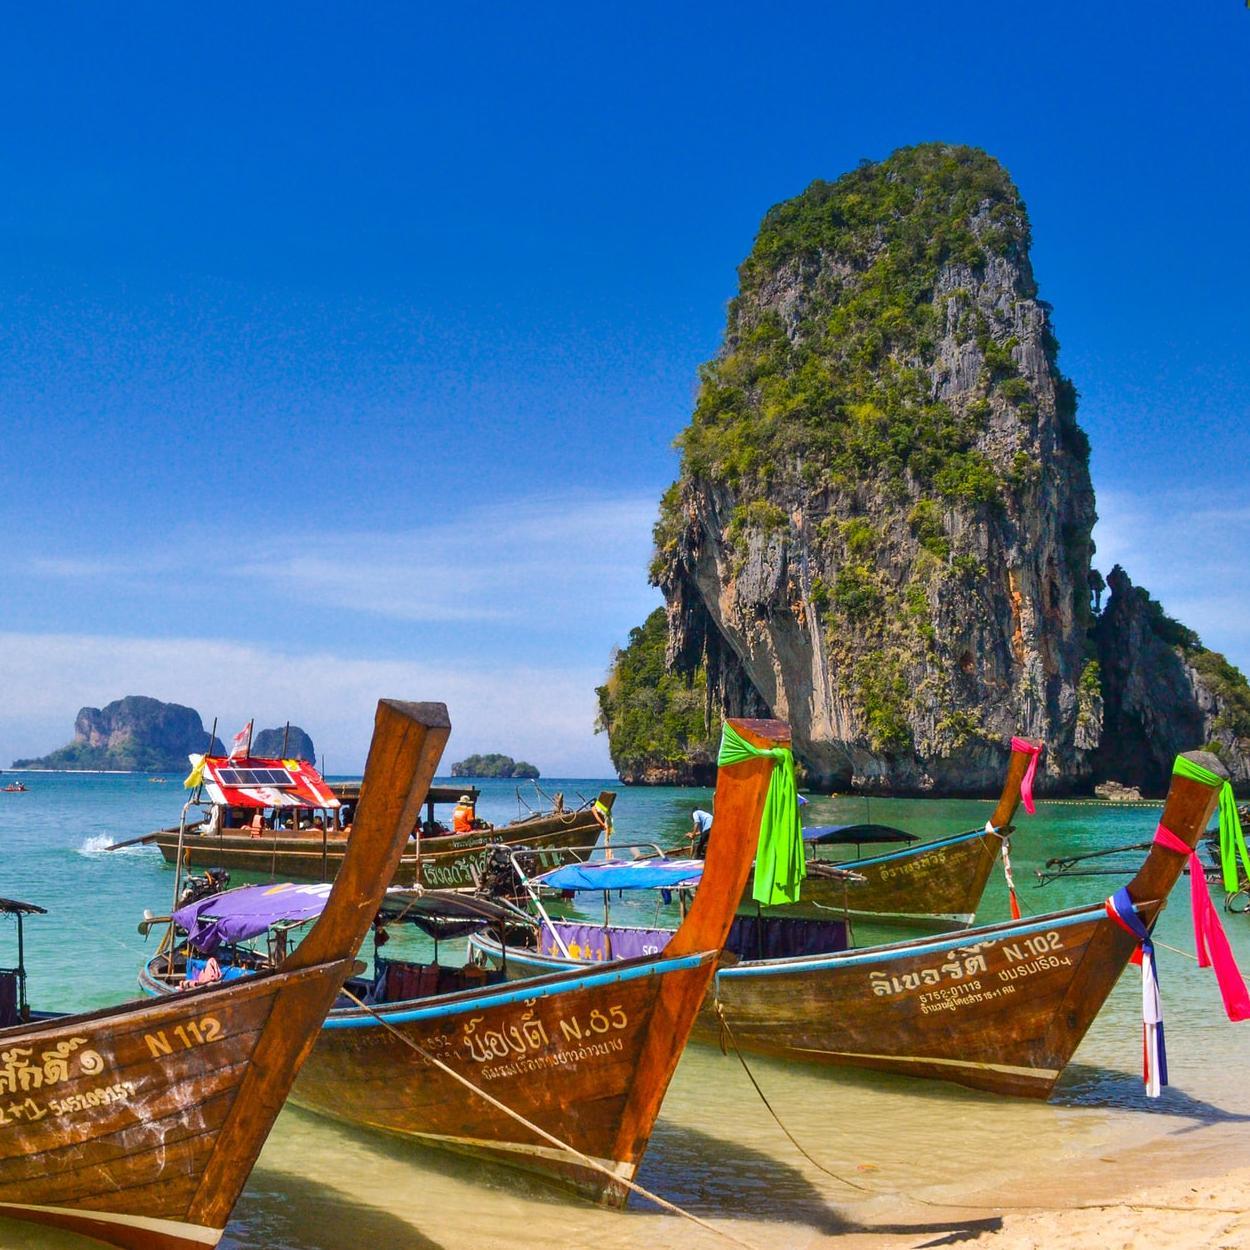 Viajar sem visto pela Ásia